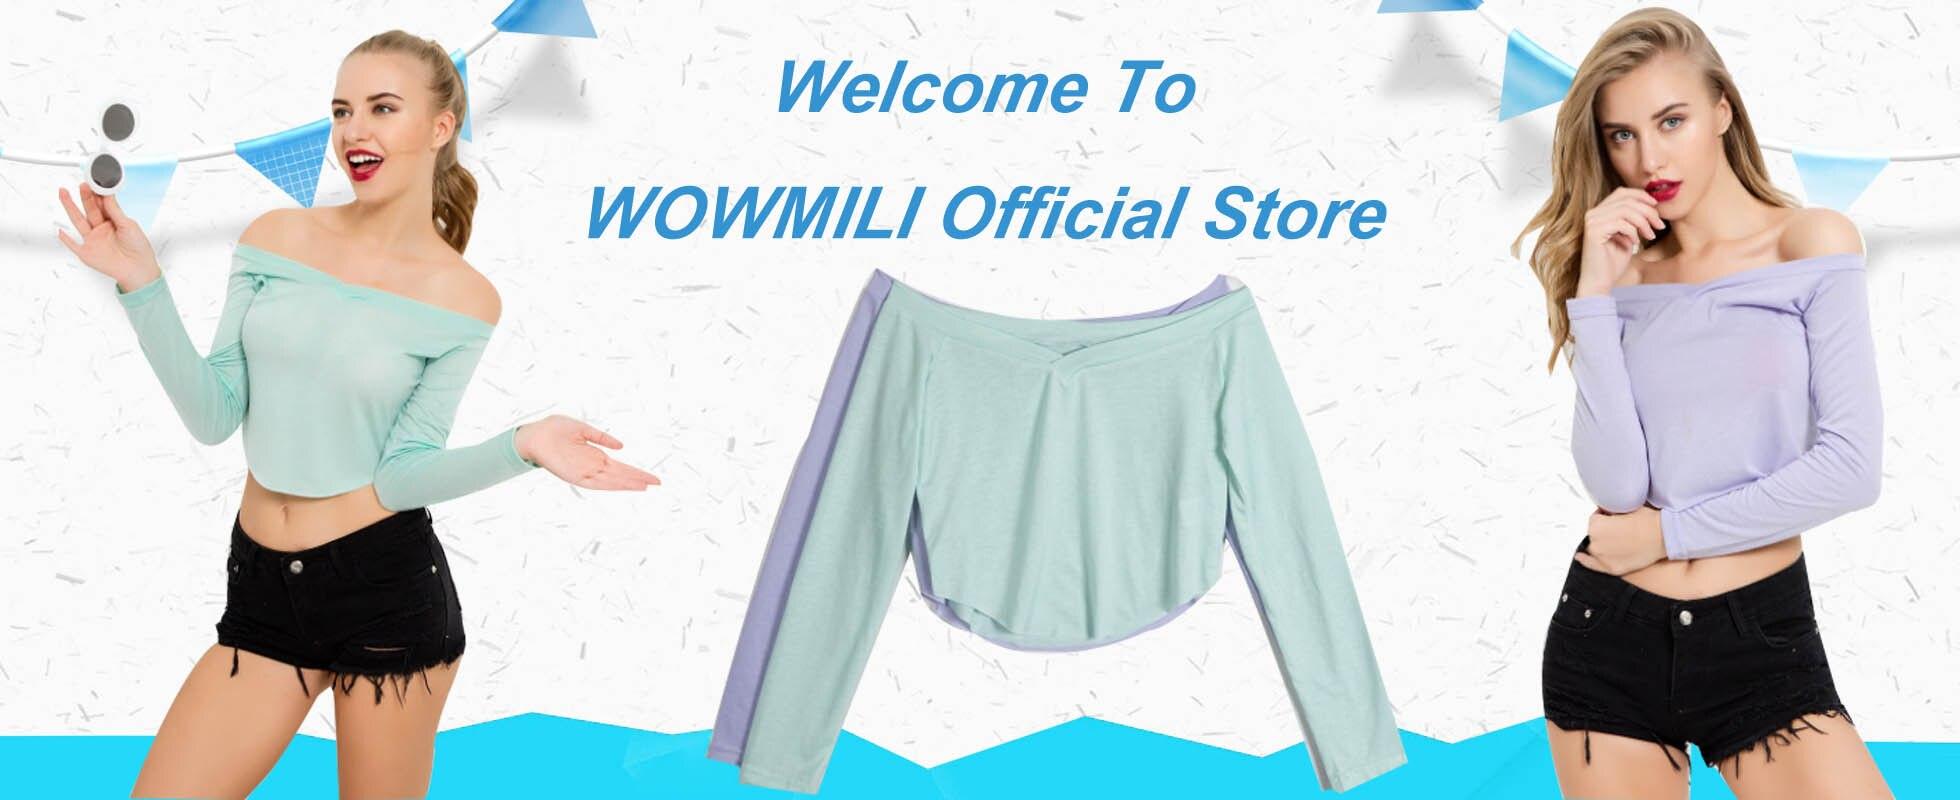 Wowmili Vip Store Small Orders Online Hot Selling And More Lgs  Regular Fit Stripe Tee Blue Gray Classic Styles Biru L Women Dresses